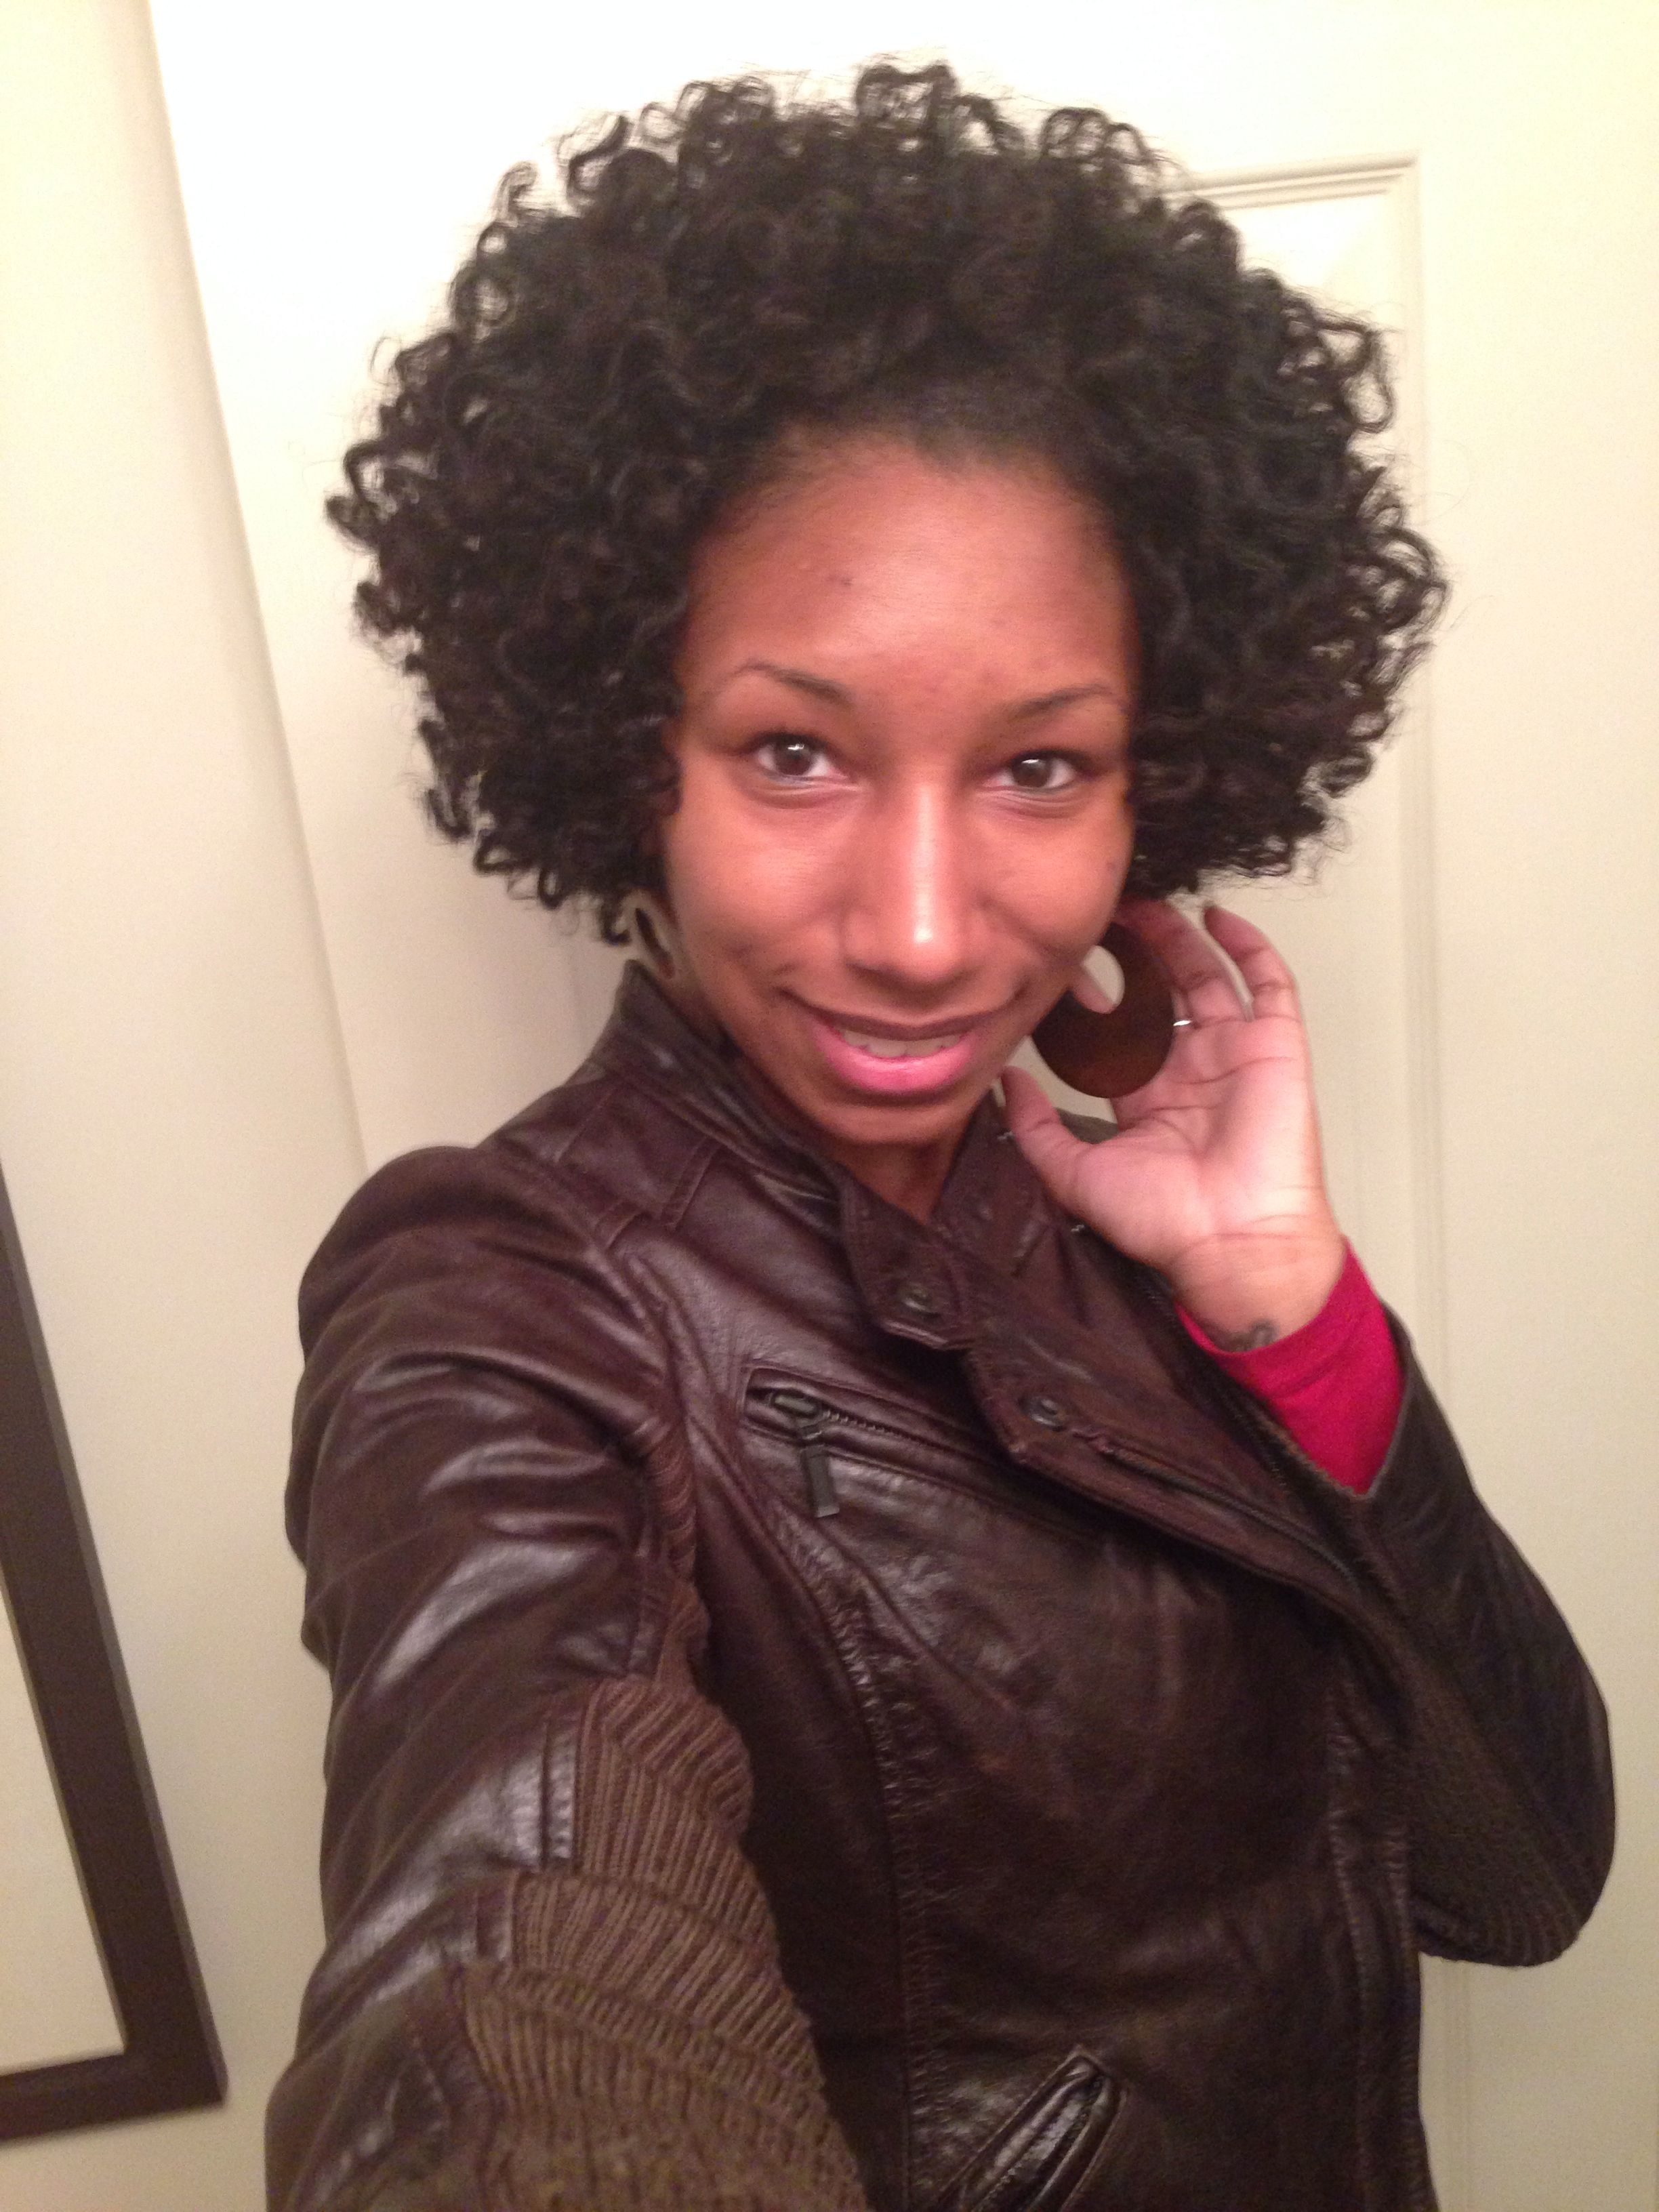 Bantu Knots On Short Wet Natural Hair